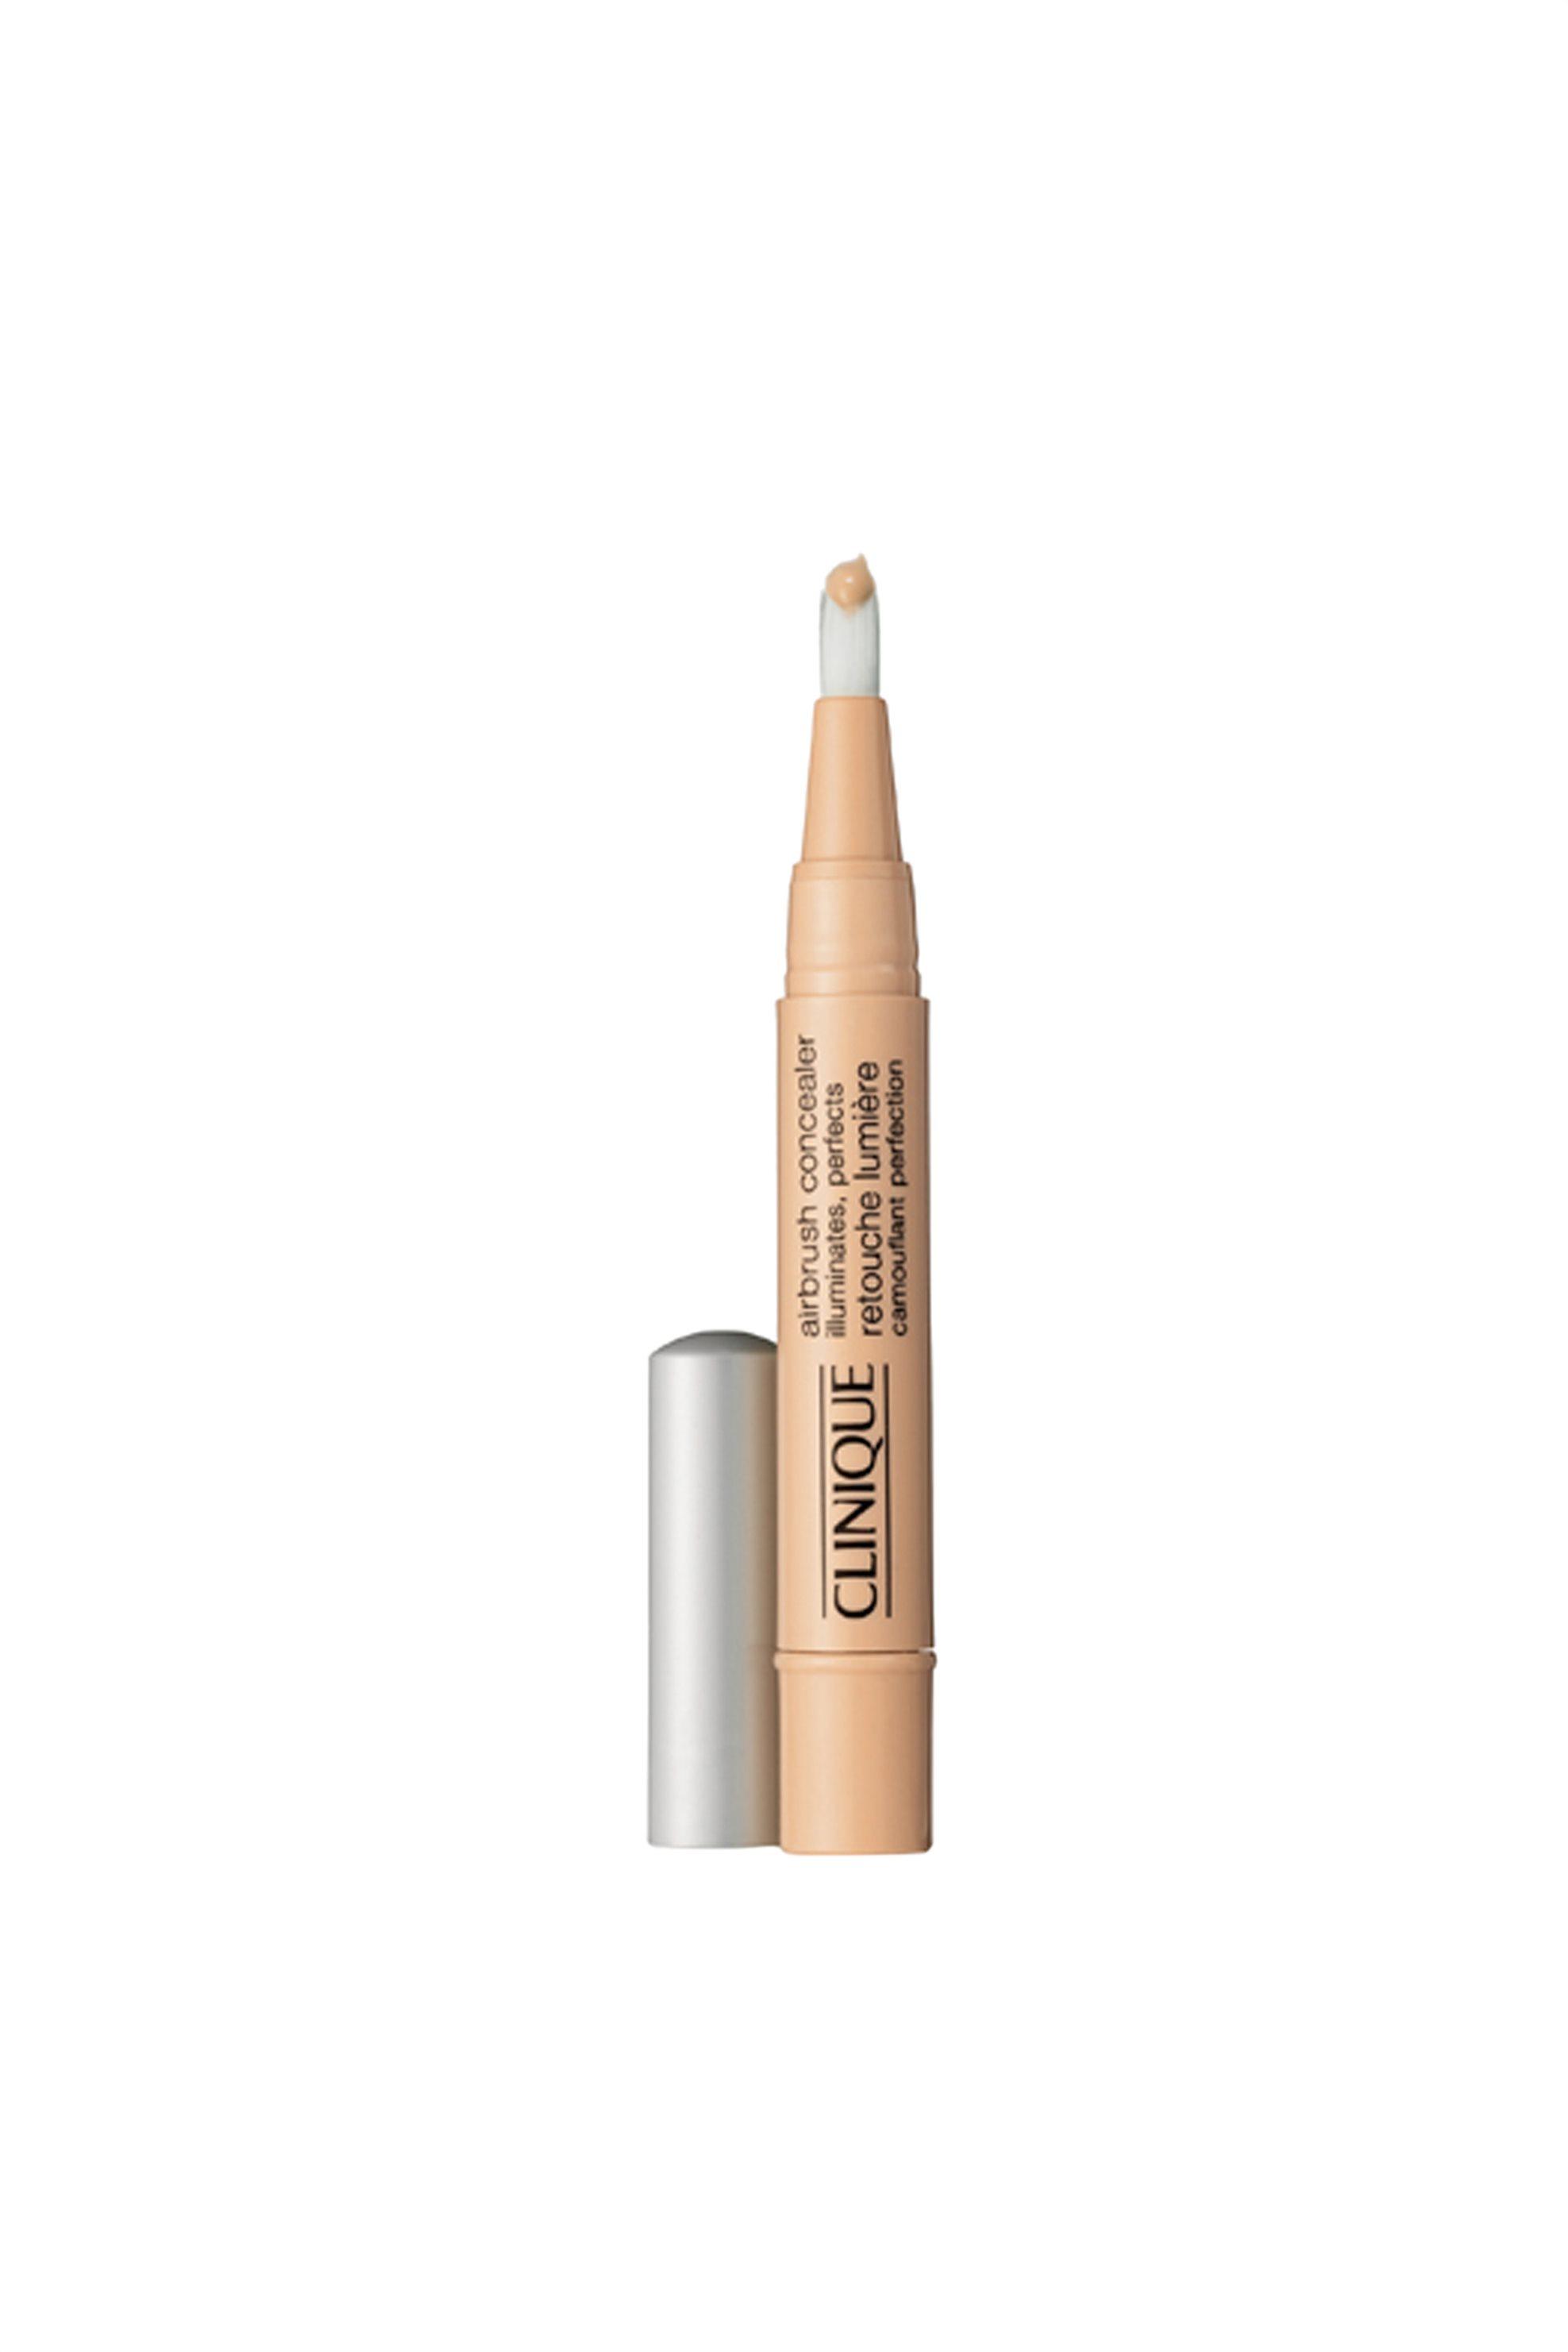 Clinique Airbrush Concealer™ 05 Fair Cream 1.5 ml - 6CM2050000 ομορφια   καλλυντικα επιλεκτικησ   μακιγιάζ   πρόσωπο   concealers